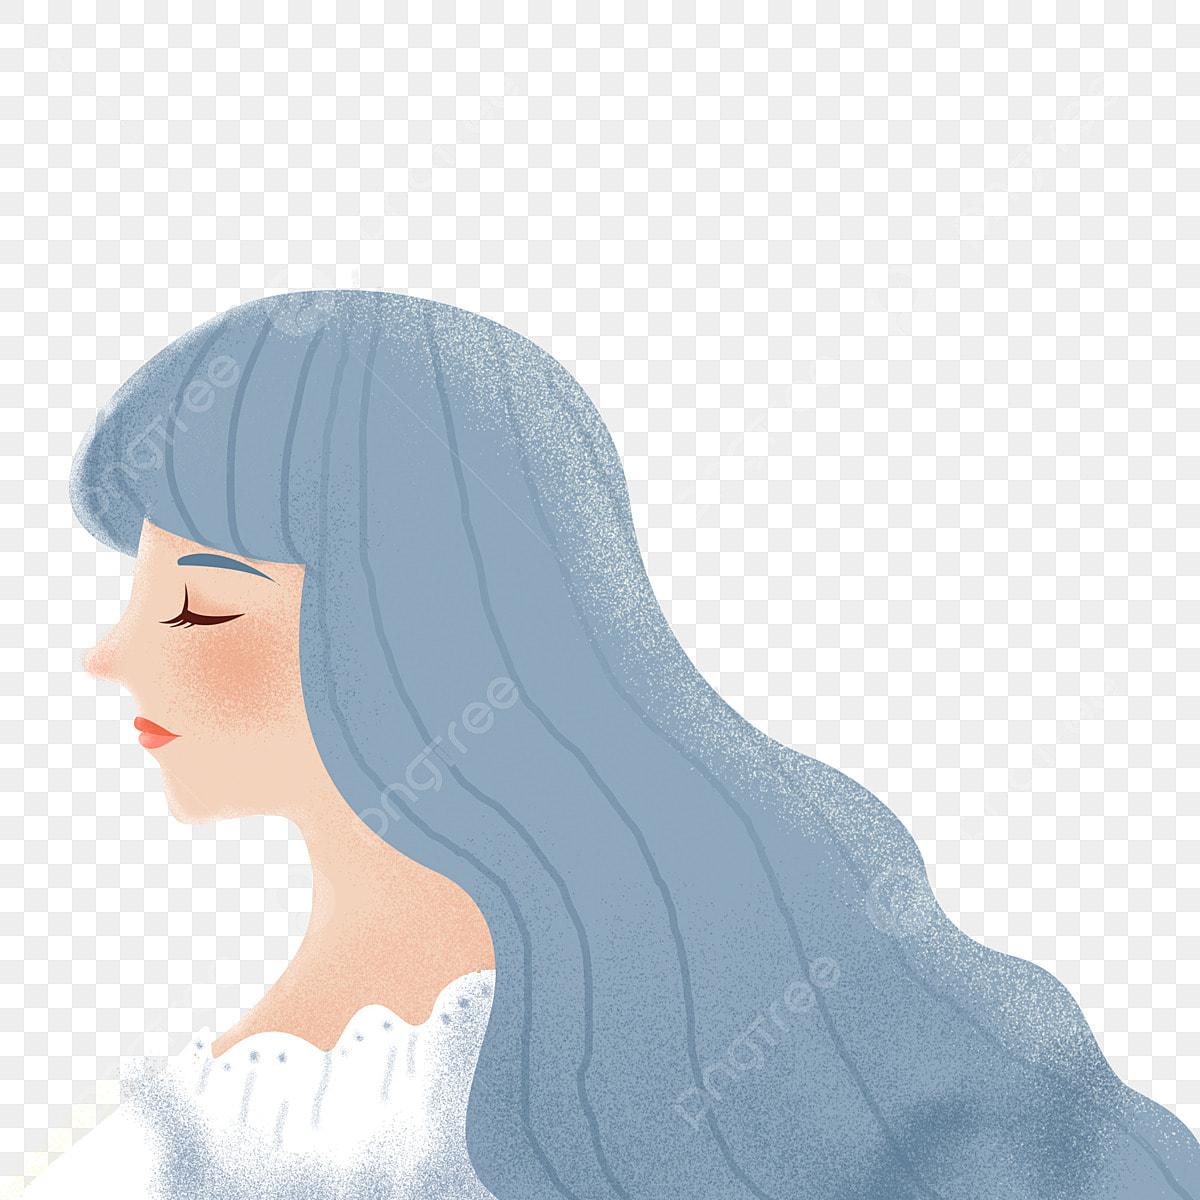 Gambar Kartun Wanita Rambut Panjang Gambar Gadis Berambut Panjang Muat Turun Percuma Rambut Panjang Kelabu Gadis Berambut Panjang Kartun Gambar Percuma Png Dan Psd Untuk Muat Turun Percuma